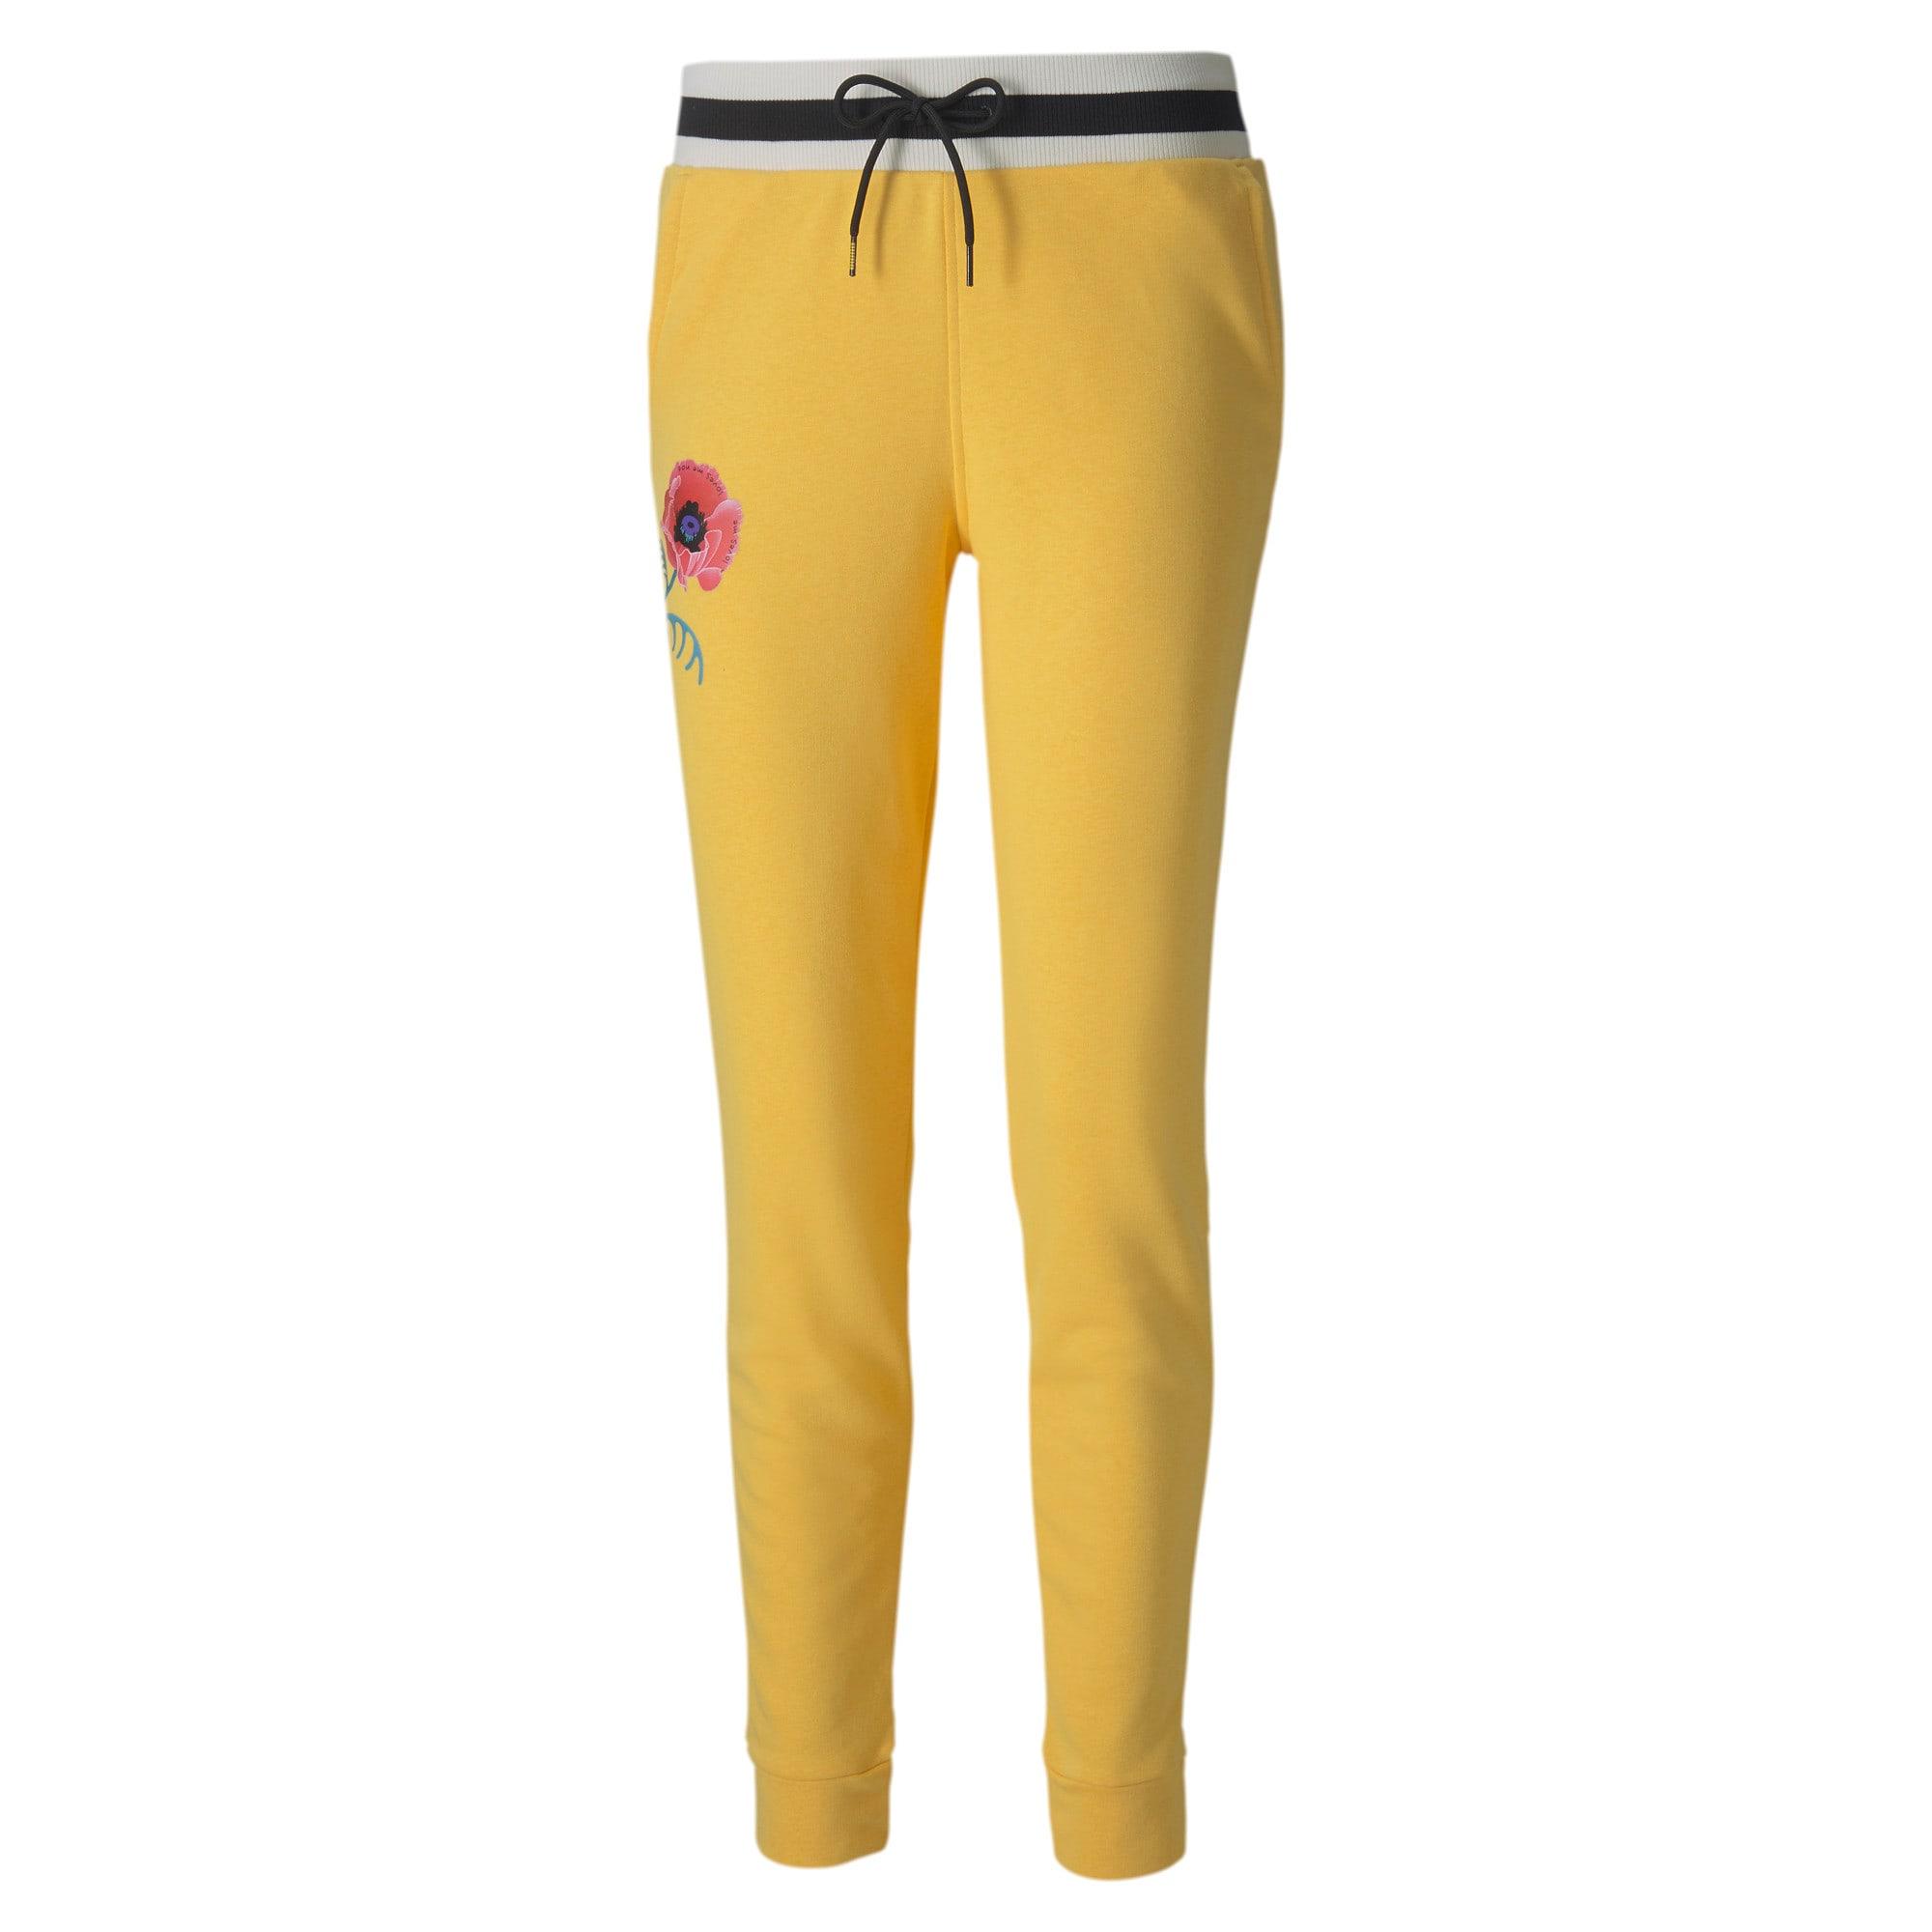 Thumbnail 1 of PUMA x SUE TSAI Women's Sweatpants, Daffodil, medium